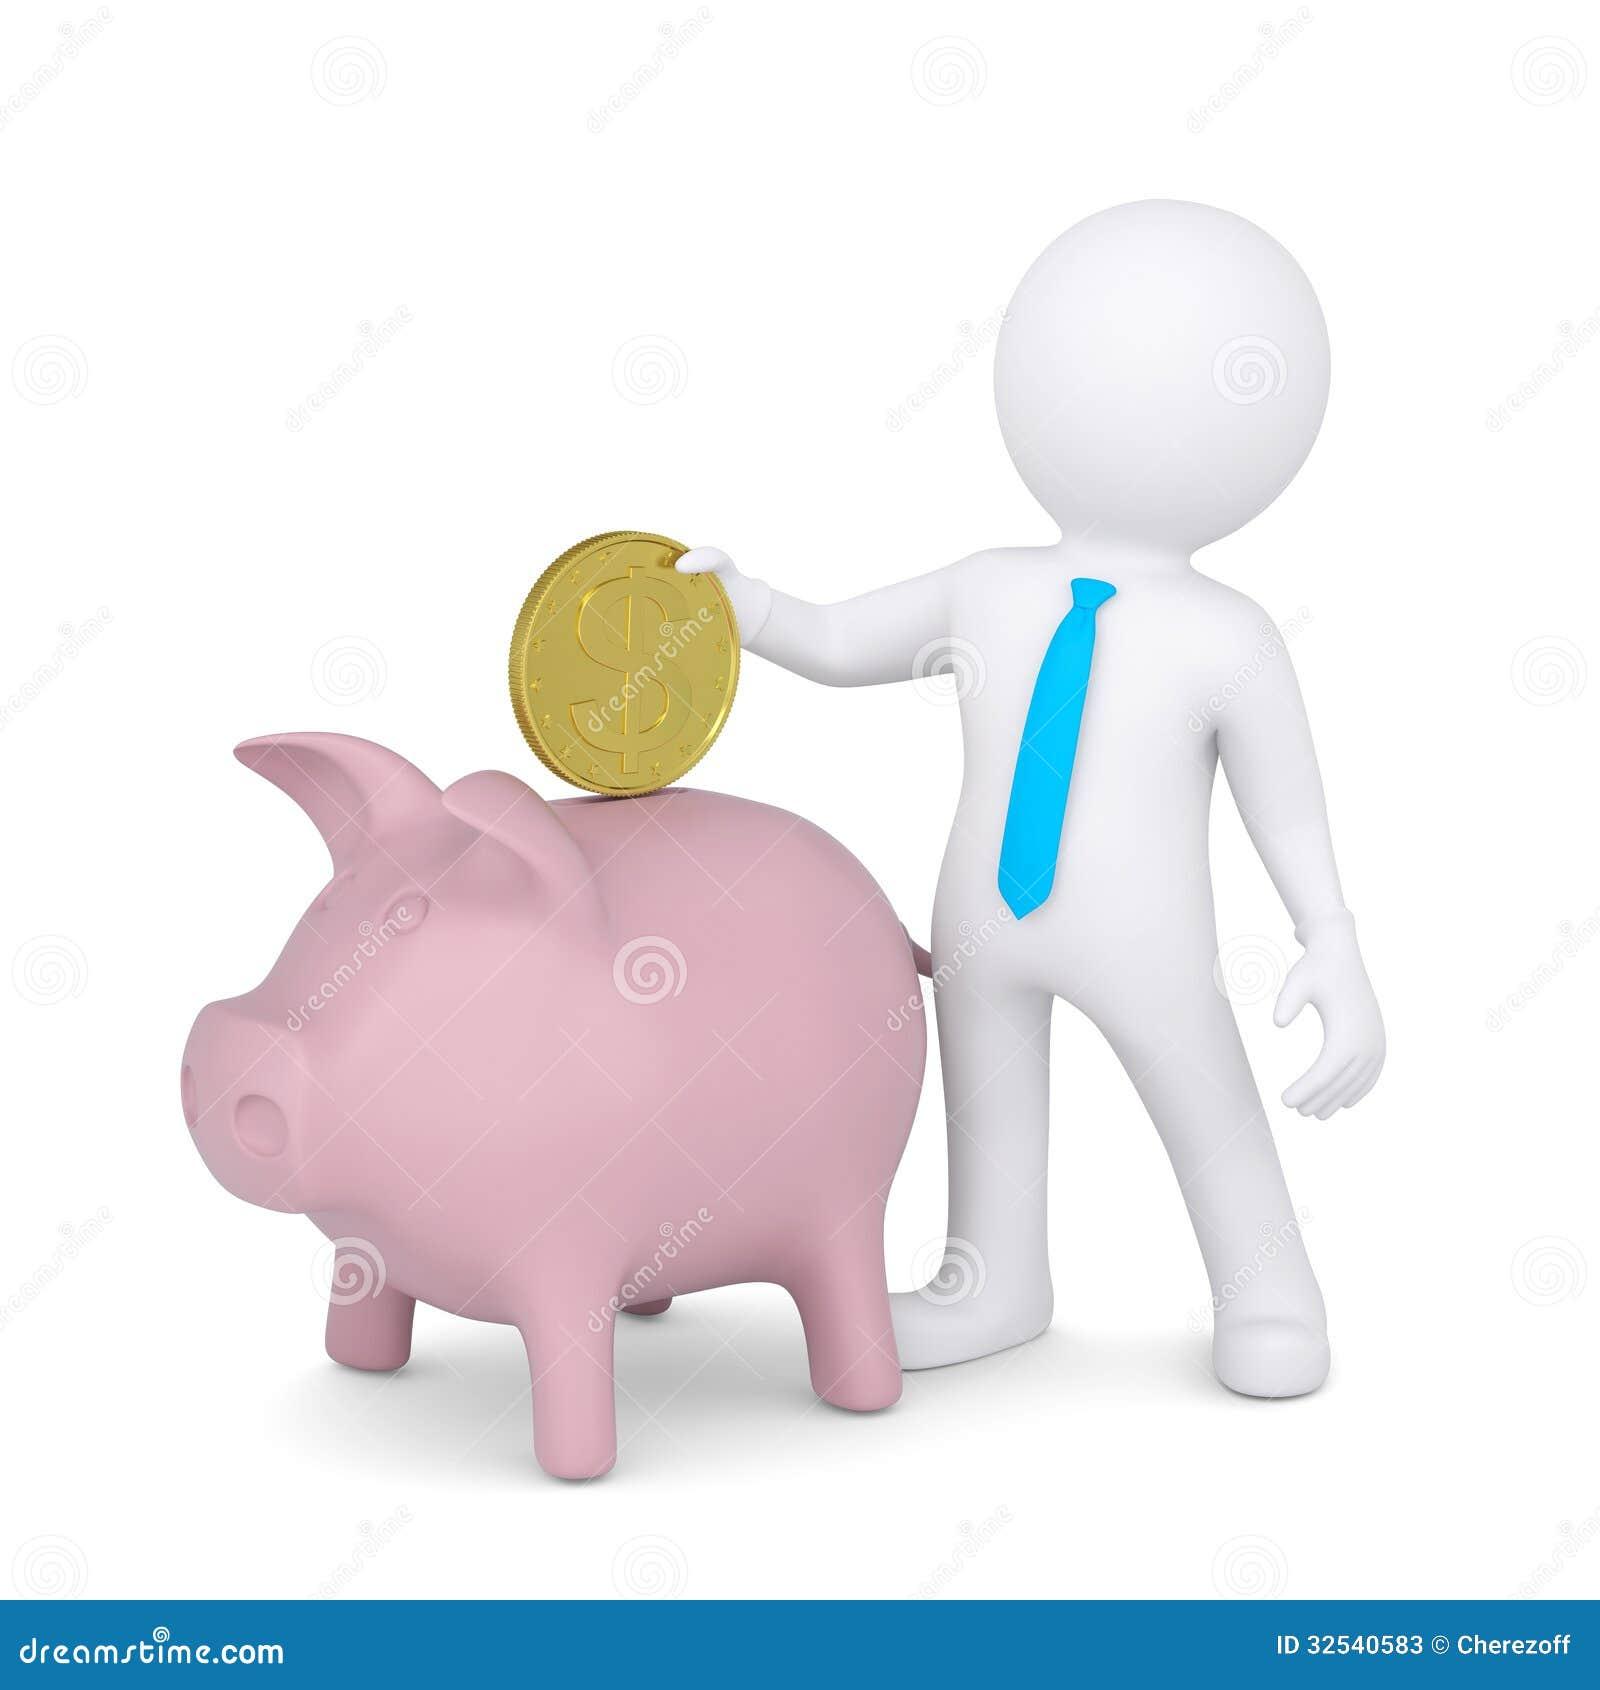 3d white man drops a coin into the piggy bank stock photos piggy clipart images clipart piggy bank images